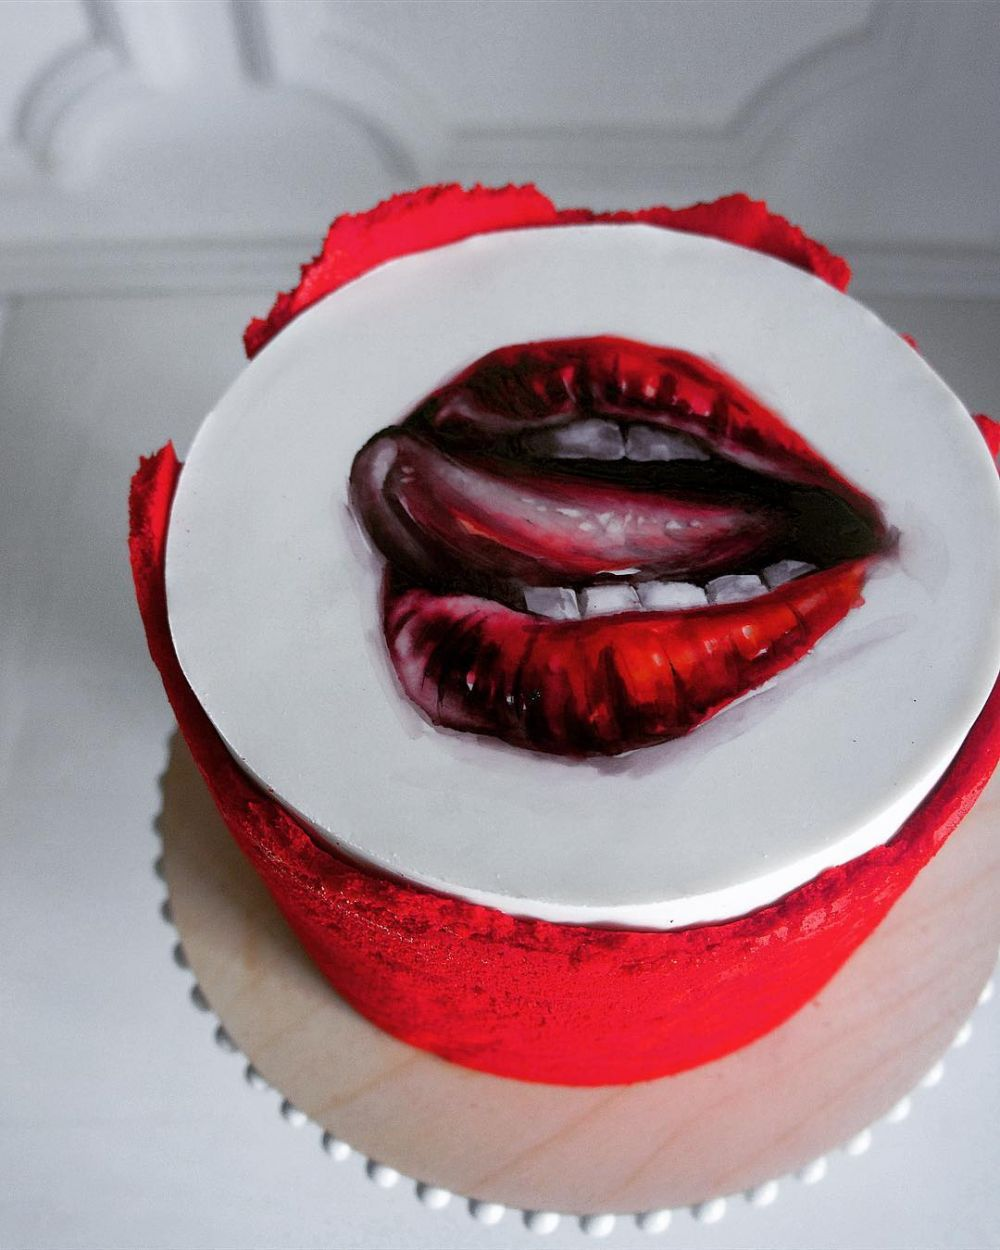 melukis di atas kue ©Instagram/@elena_gnut_cake